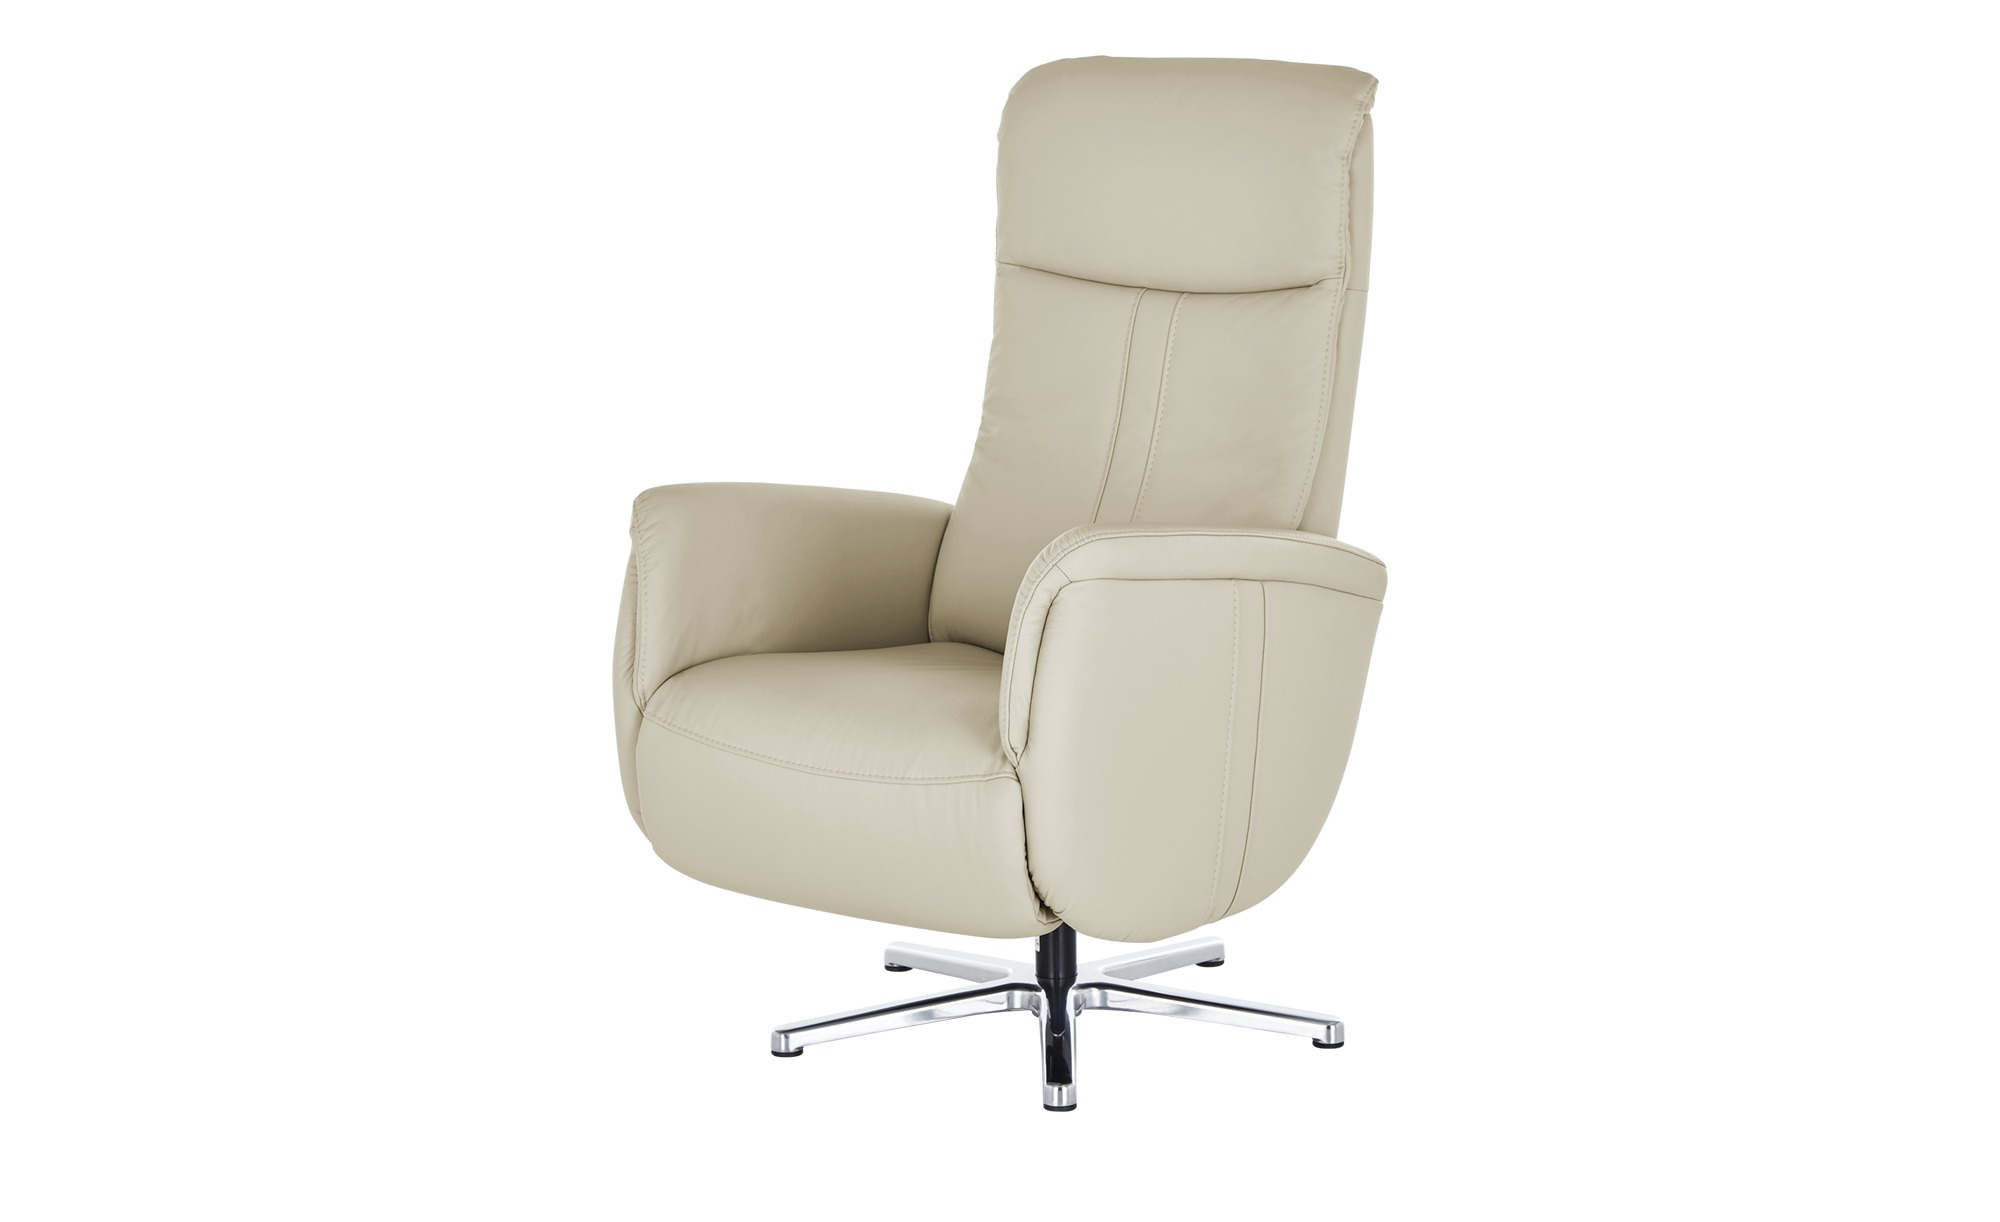 meinSofa Relaxsessel  Franzi-L ¦ creme ¦ Maße (cm): B: 71 H: 112 T: 83 Polstermöbel > Sessel > Fernsehsessel - Höffner | Wohnzimmer > Sessel > Relaxsessel | Möbel Höffner DE